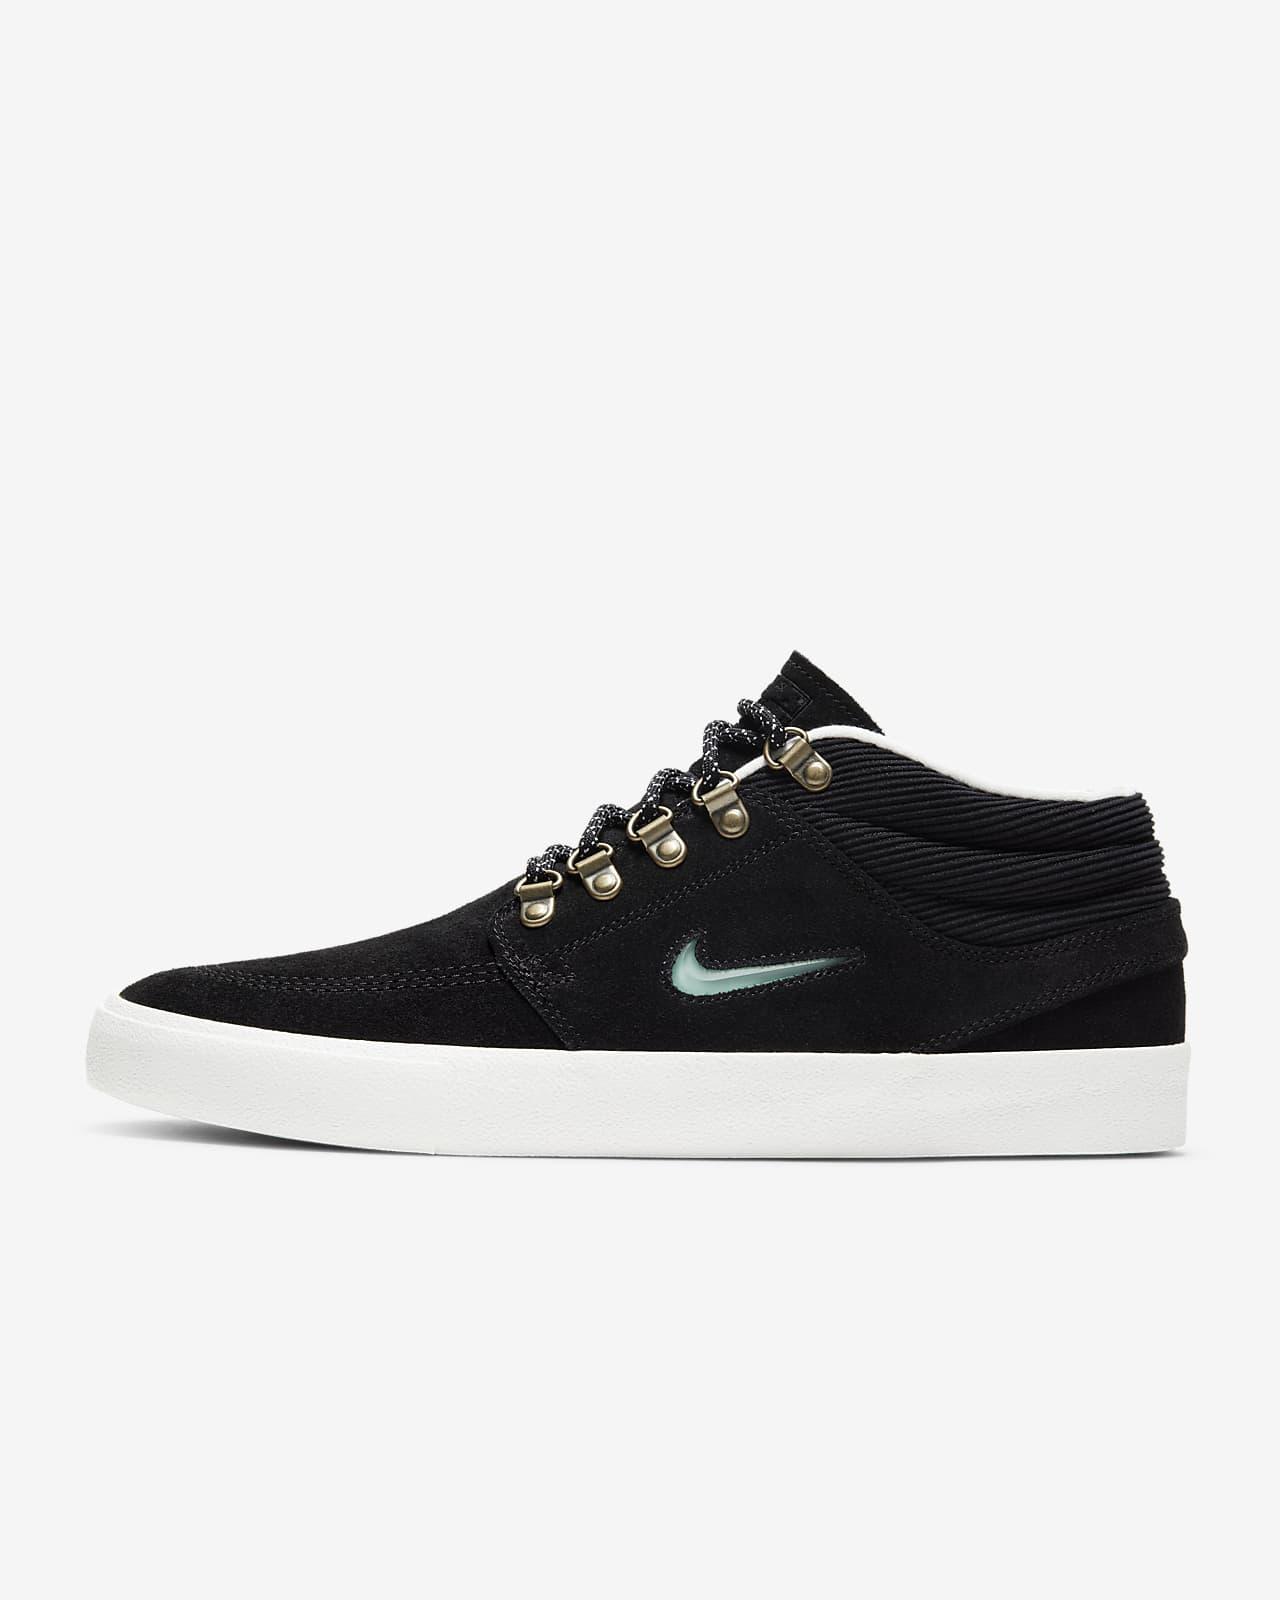 Nike SB Zoom Stefan Janoski Mid Premium Skate Shoe